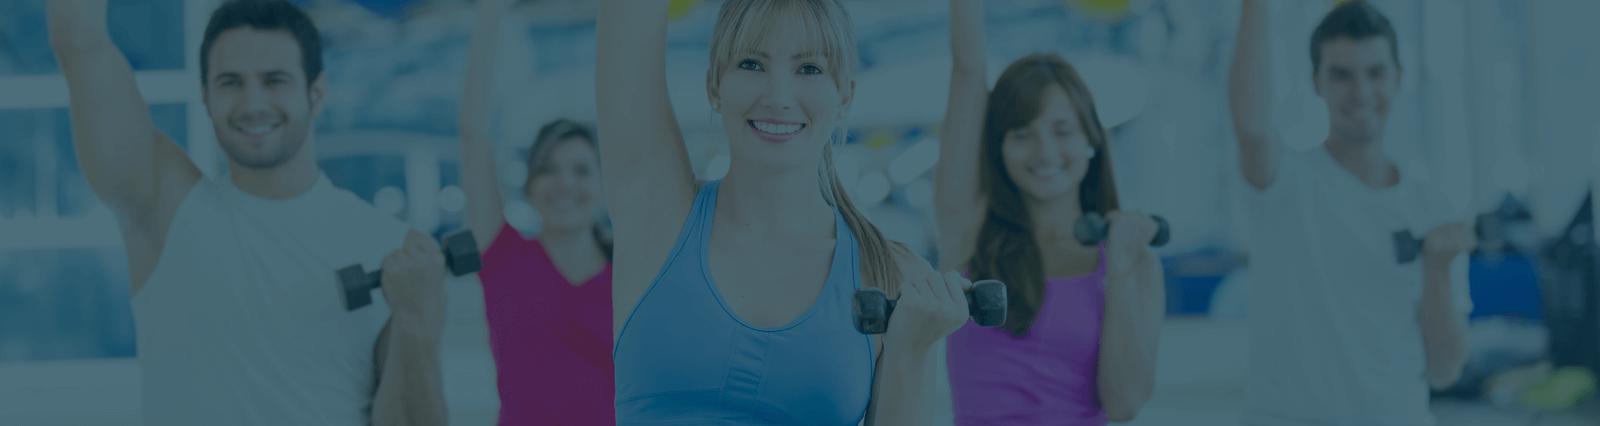 Fitness-img